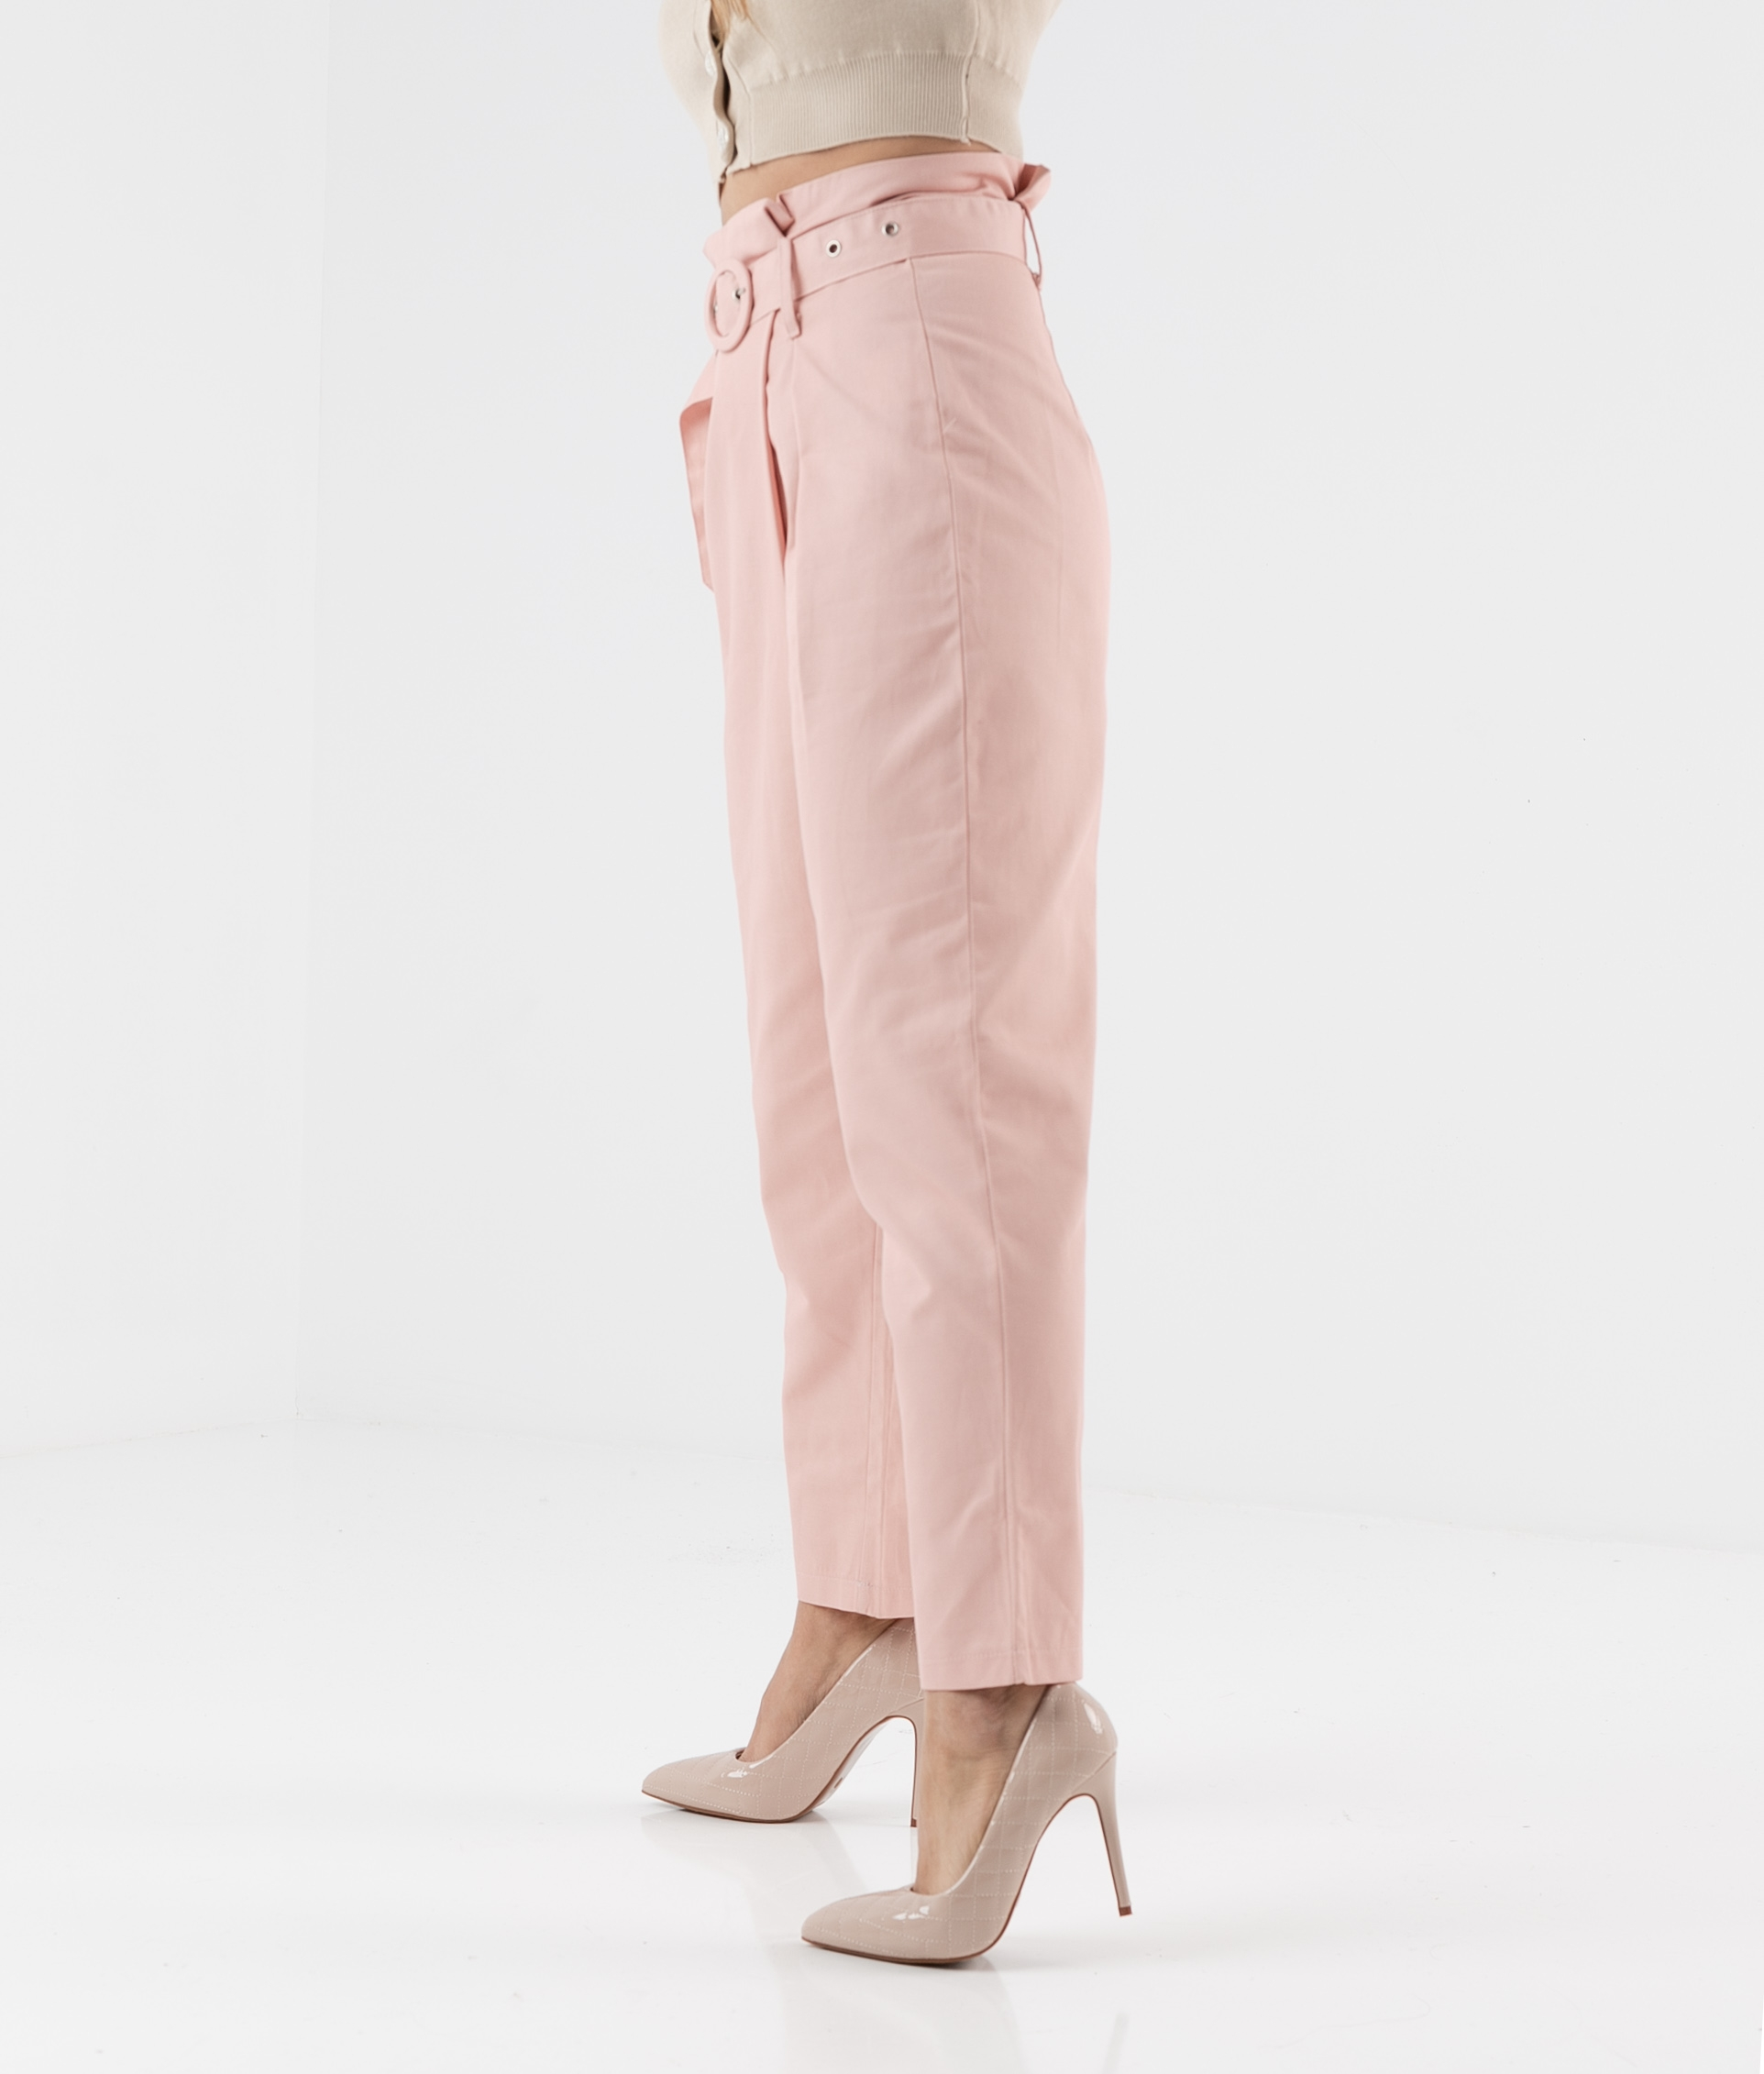 Pantalón Kenira - Rose